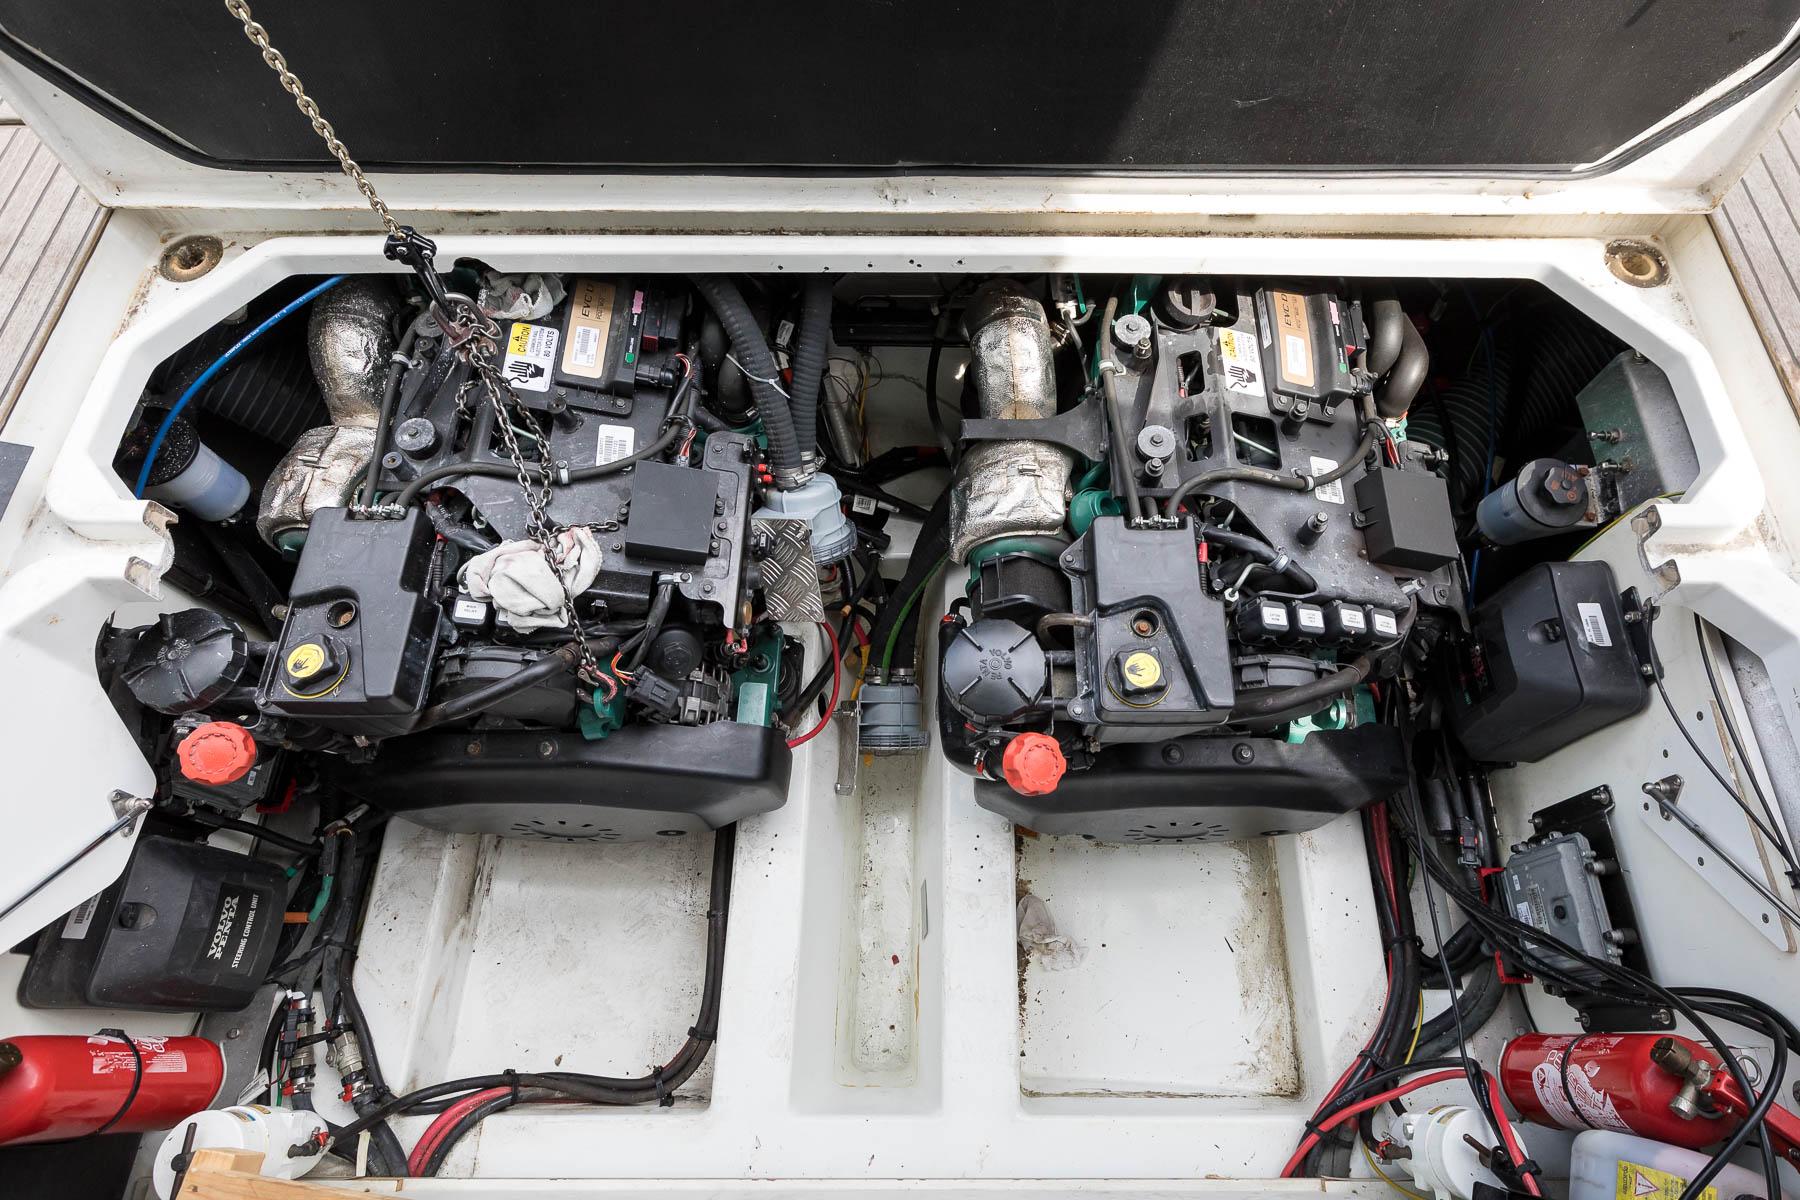 Motorenwartung-Jeanneau-NC-11-Norman-Bootsbau-Potsdam